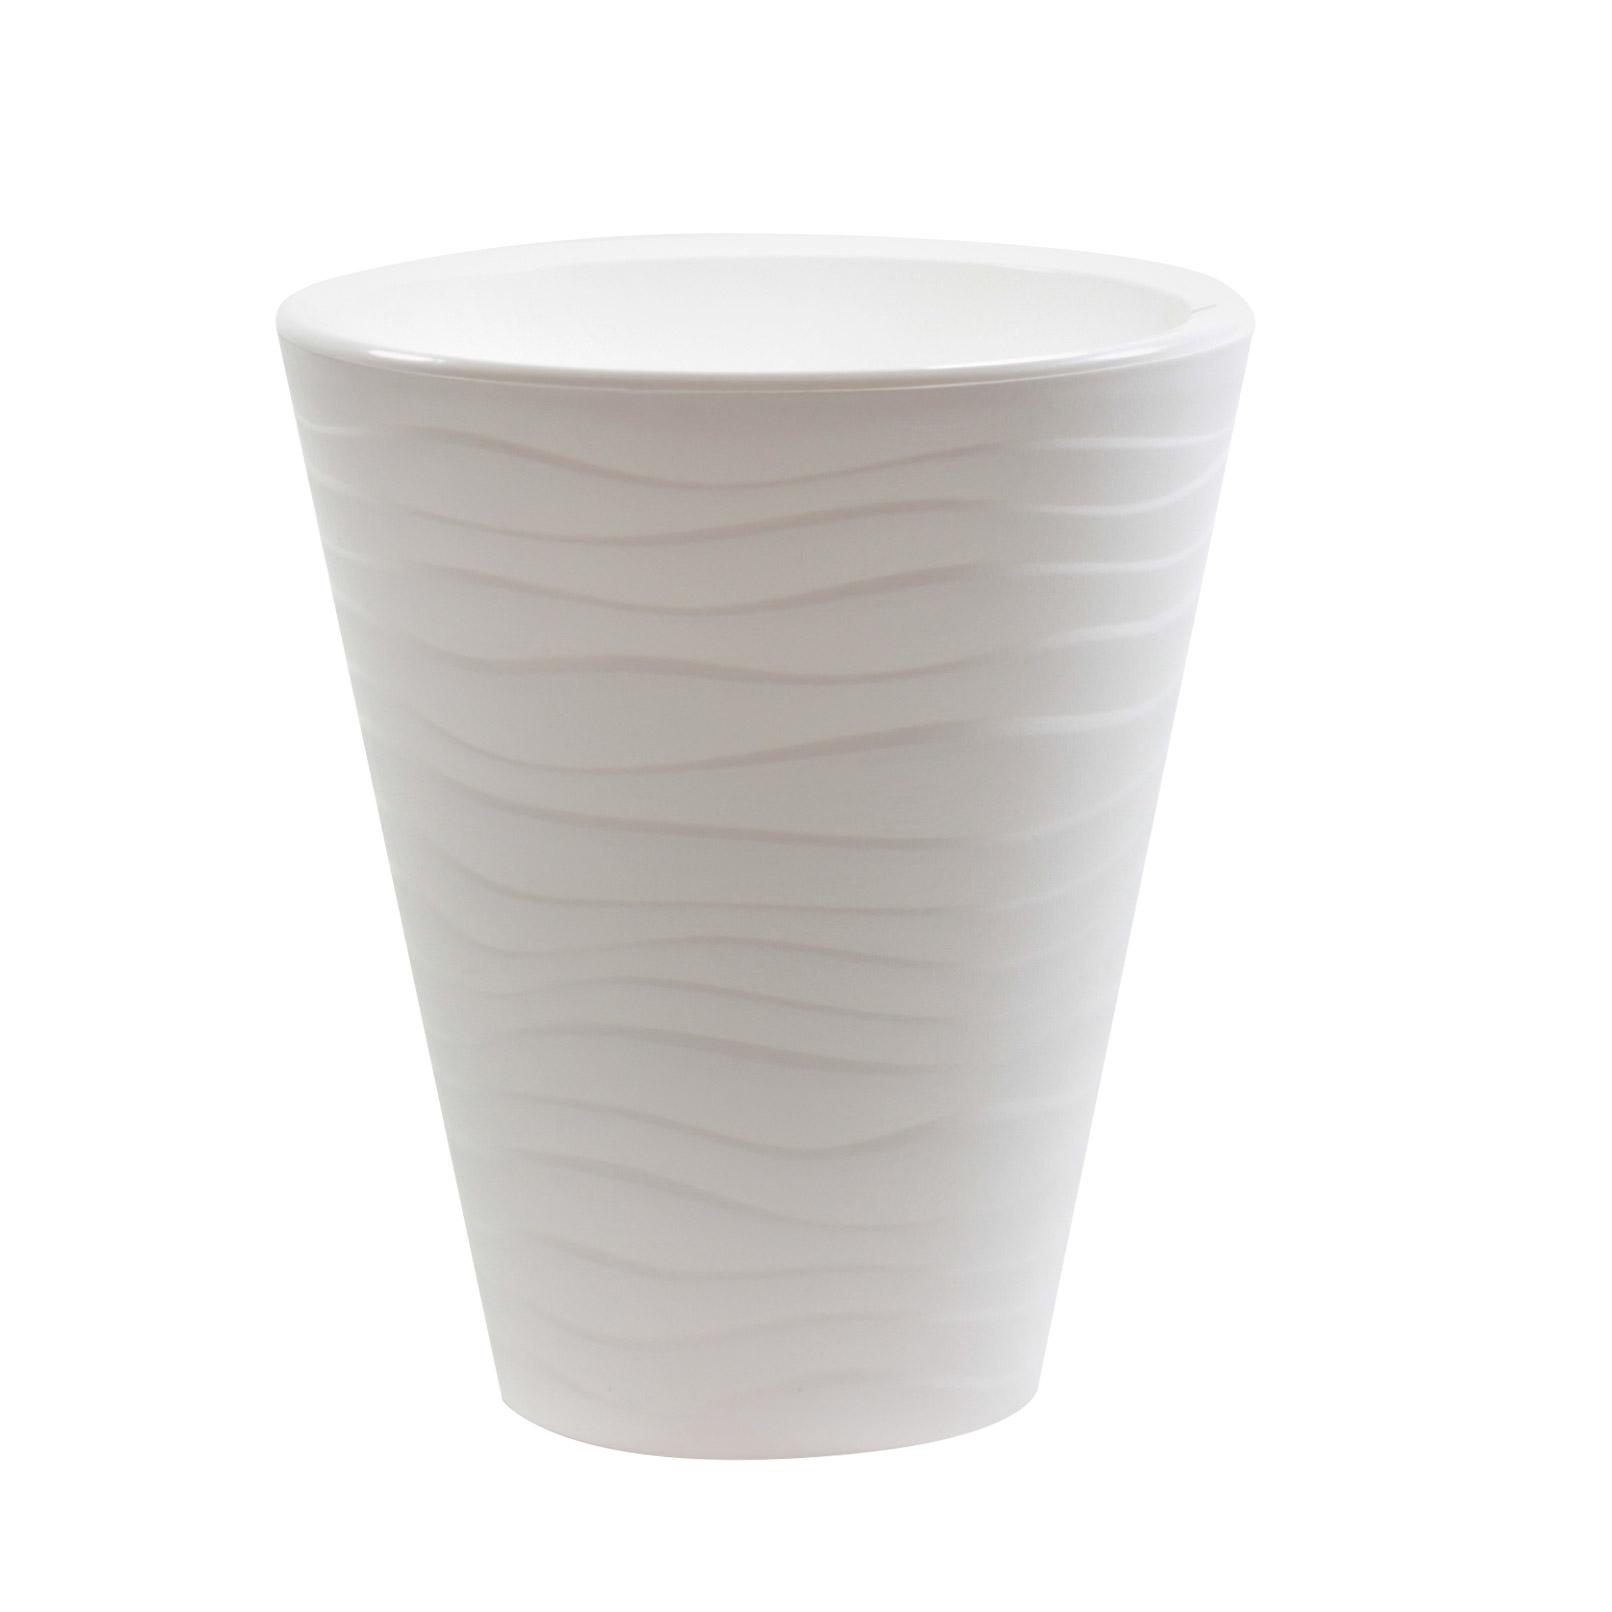 Кашпо Пластавеню Валенсия 2.8л. Белый d-17 см фото